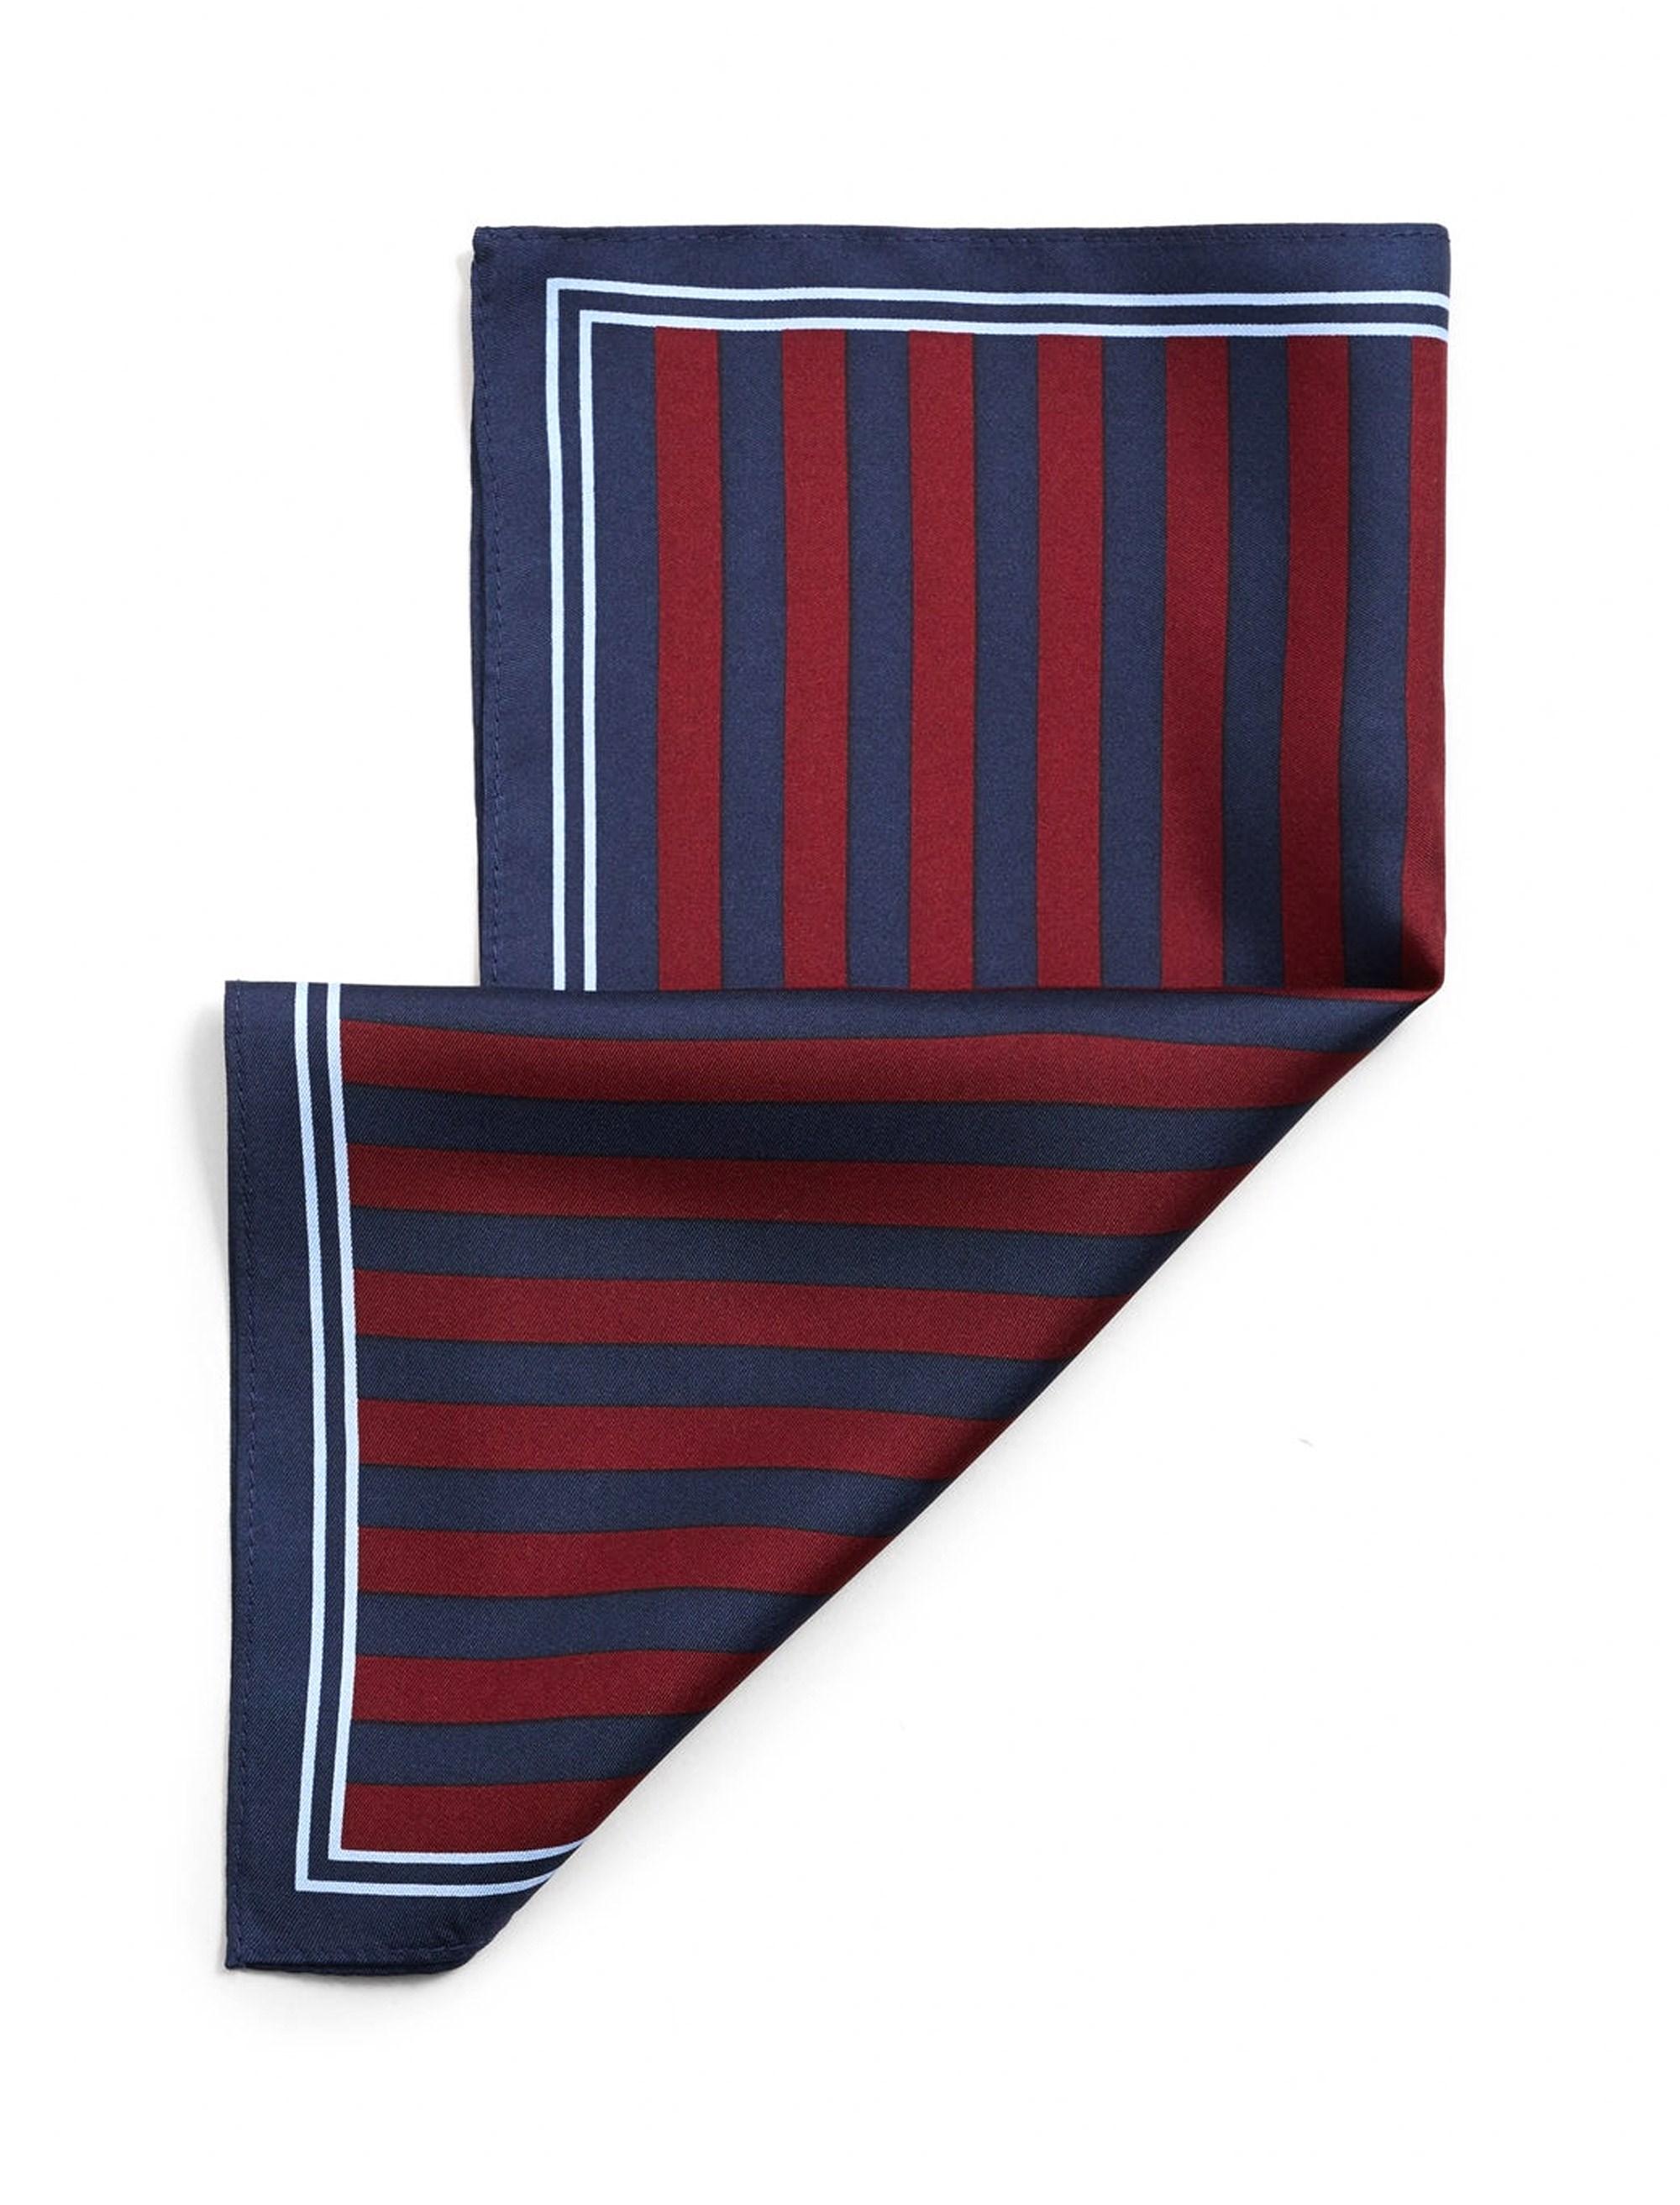 دستمال جیب ابریشم طرح دار مردانه - مانگو